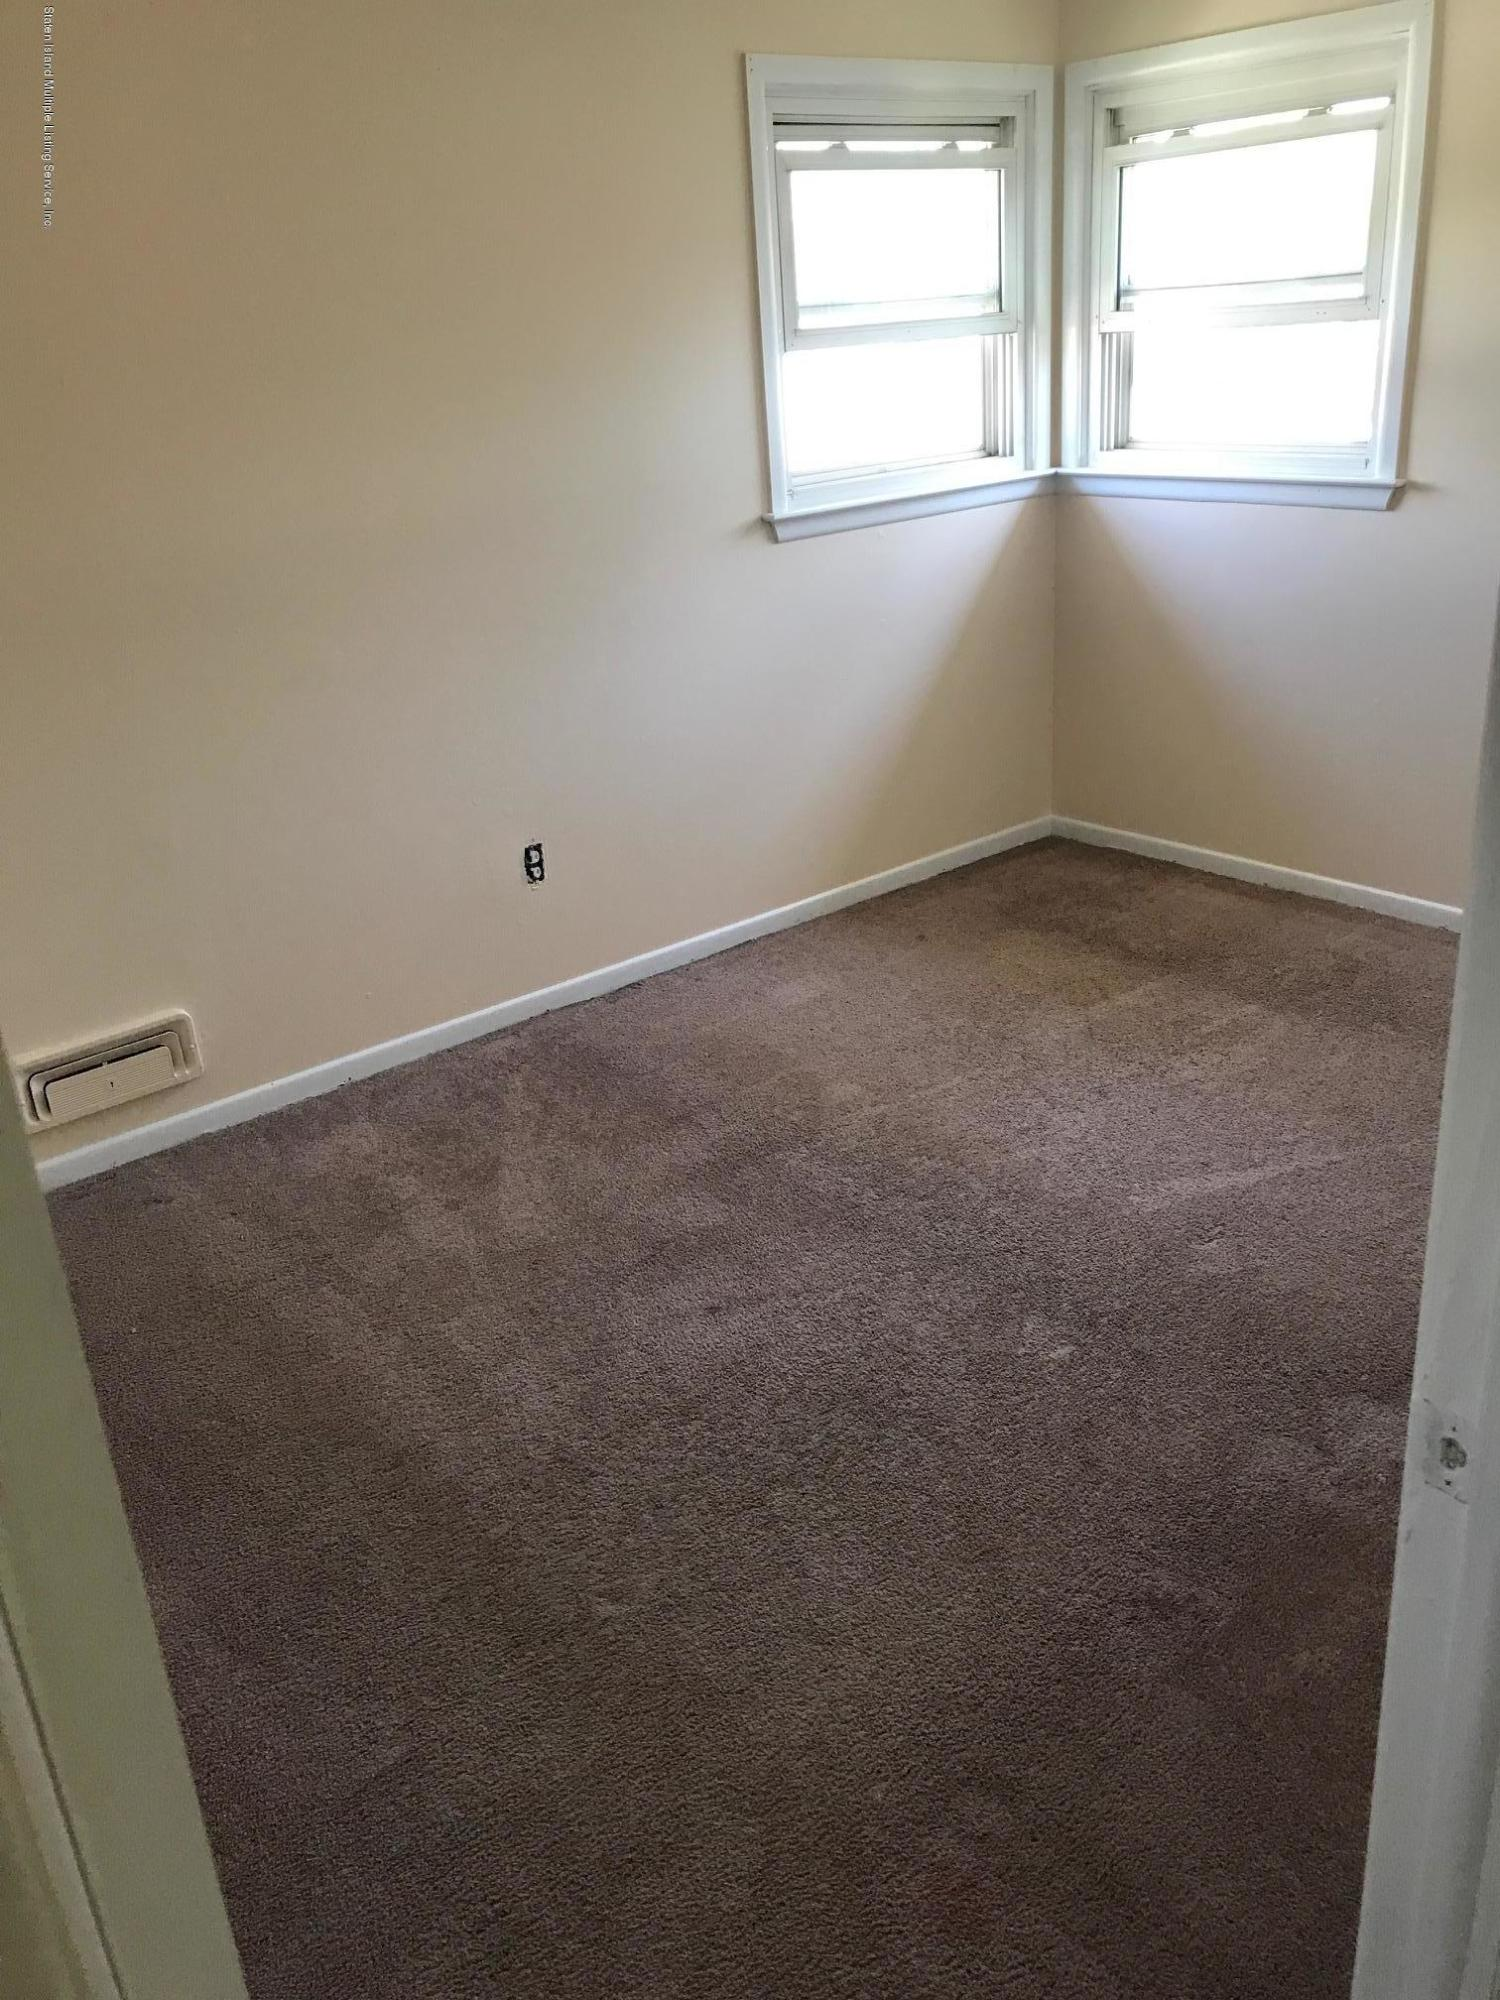 477 Tysens Lane,Staten Island,New York,10306,United States,3 Bedrooms Bedrooms,6 Rooms Rooms,1 BathroomBathrooms,Res-Rental,Tysens,1128778